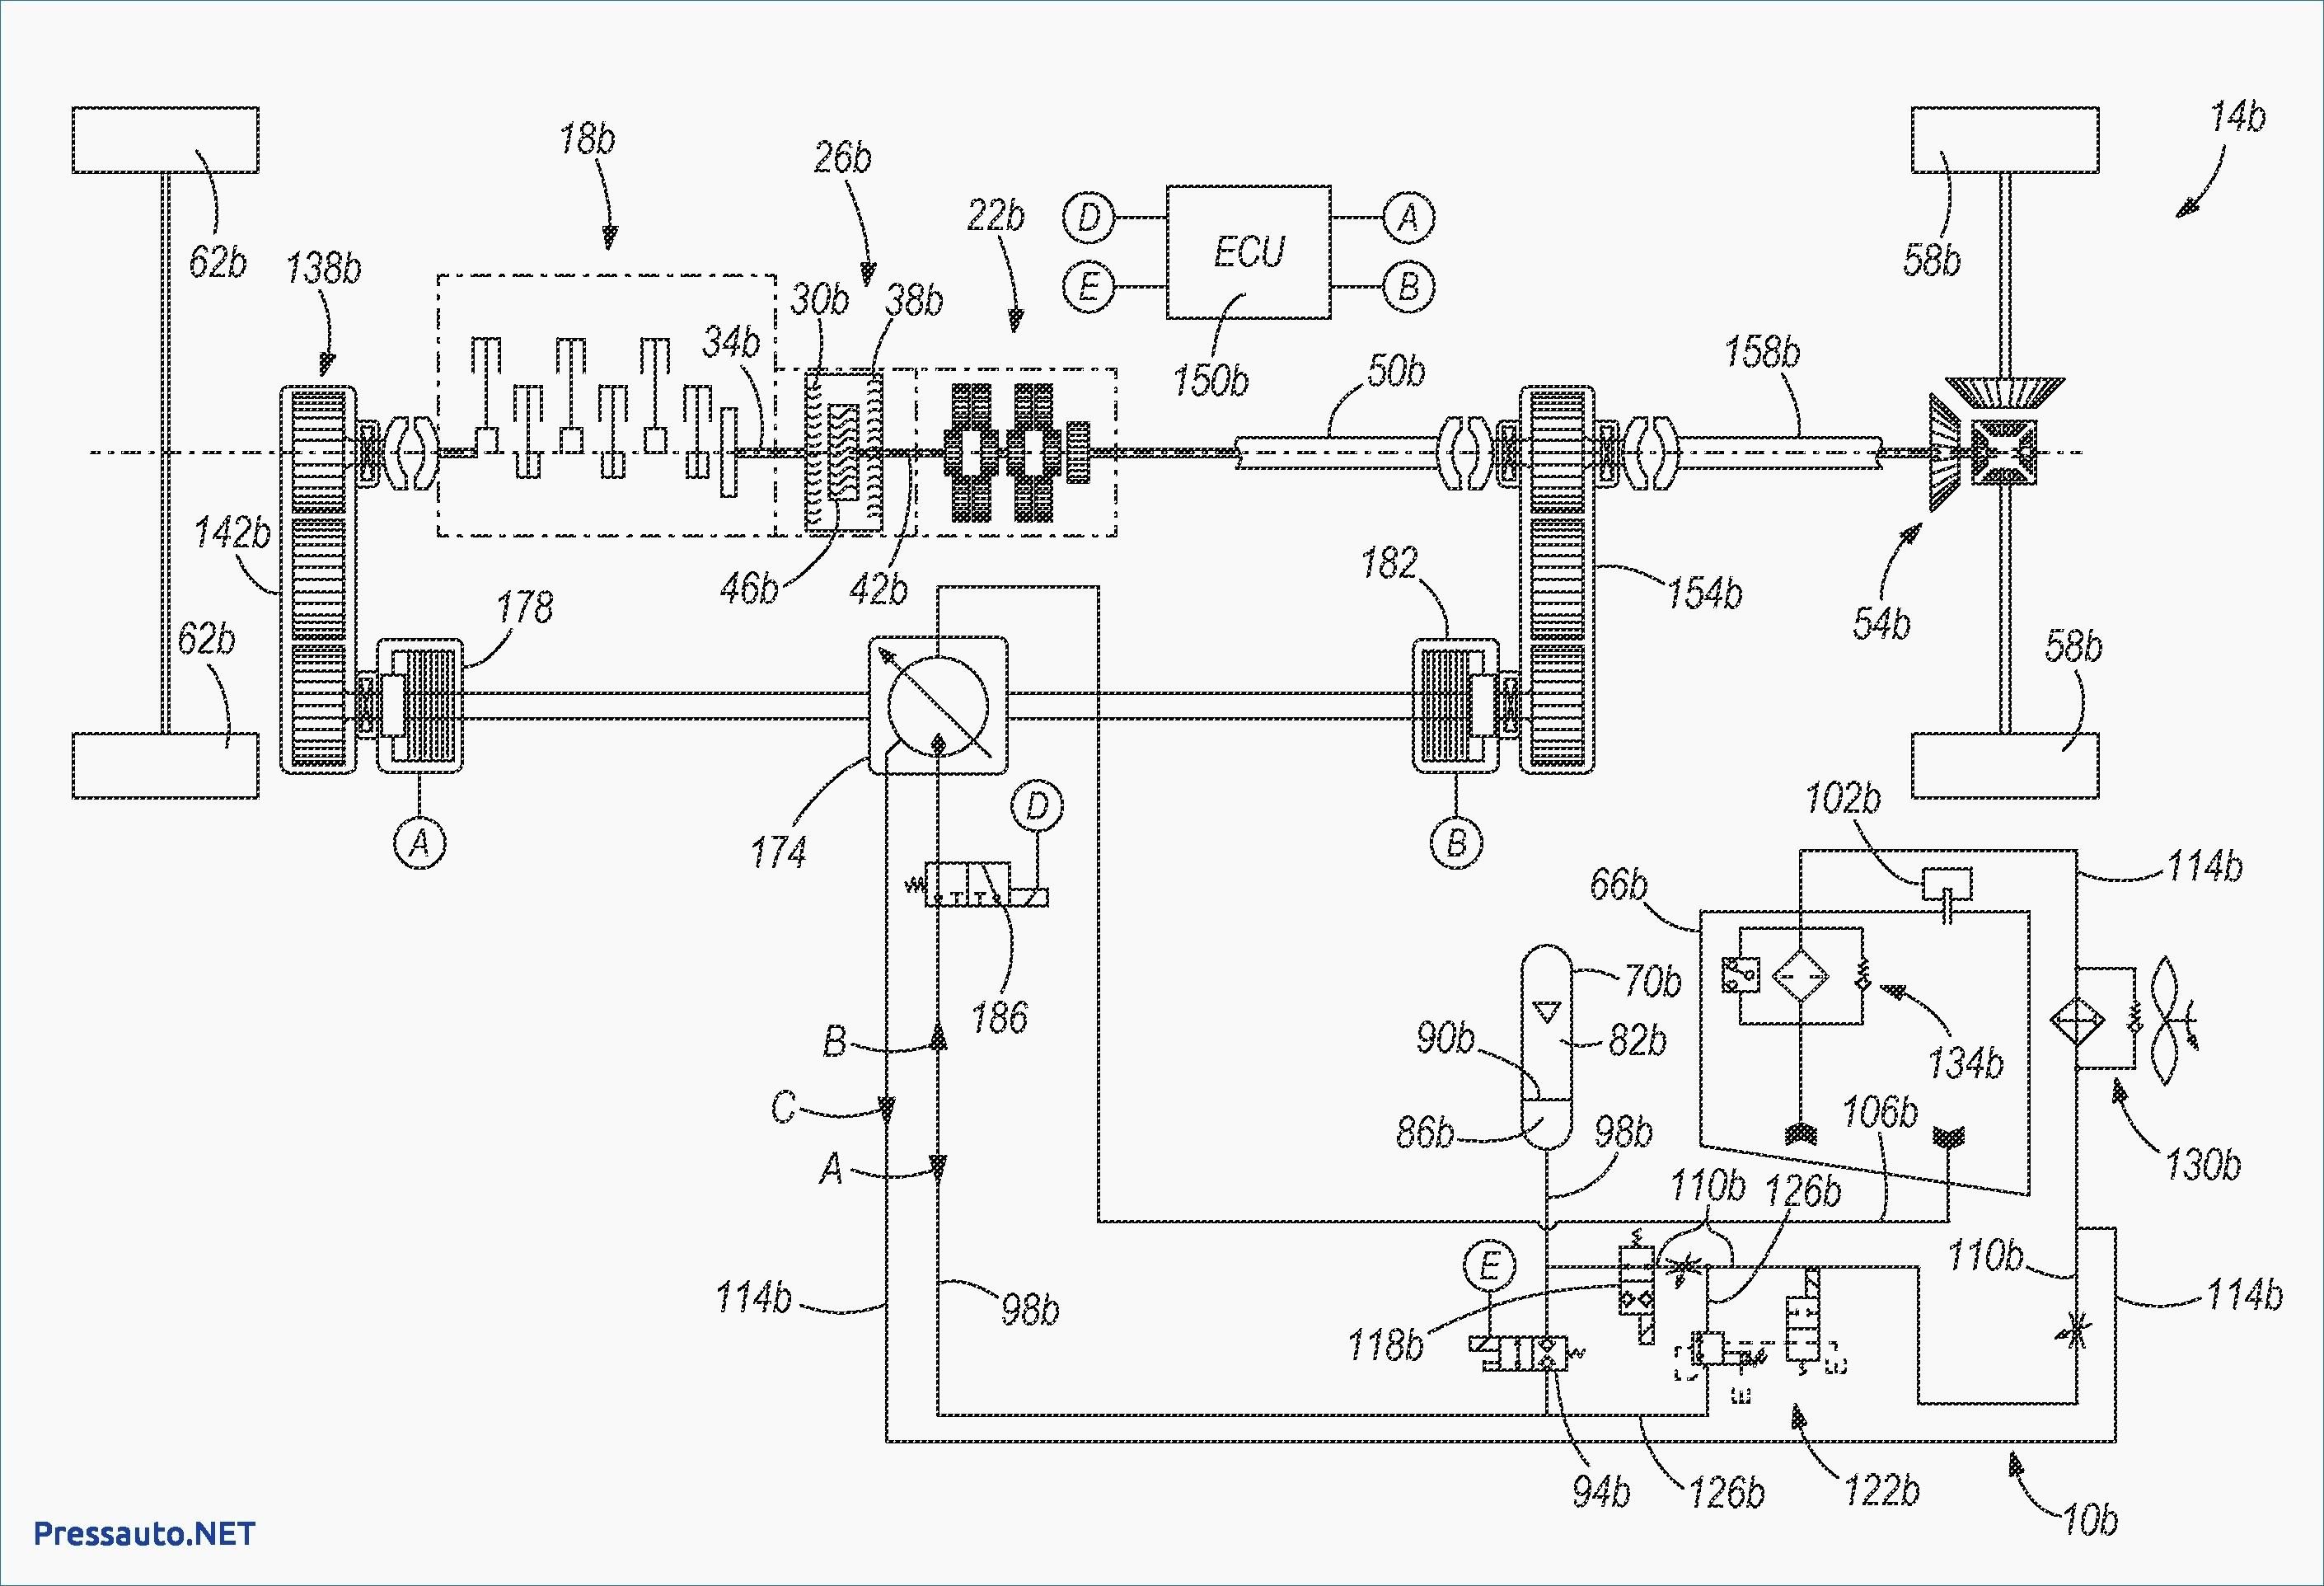 wiring diagram mahindra 7010 wiring diagram centre wiring diagram mahindra 475 wiring diagrammahindra 2216 wiring diagram [ 2820 x 1924 Pixel ]